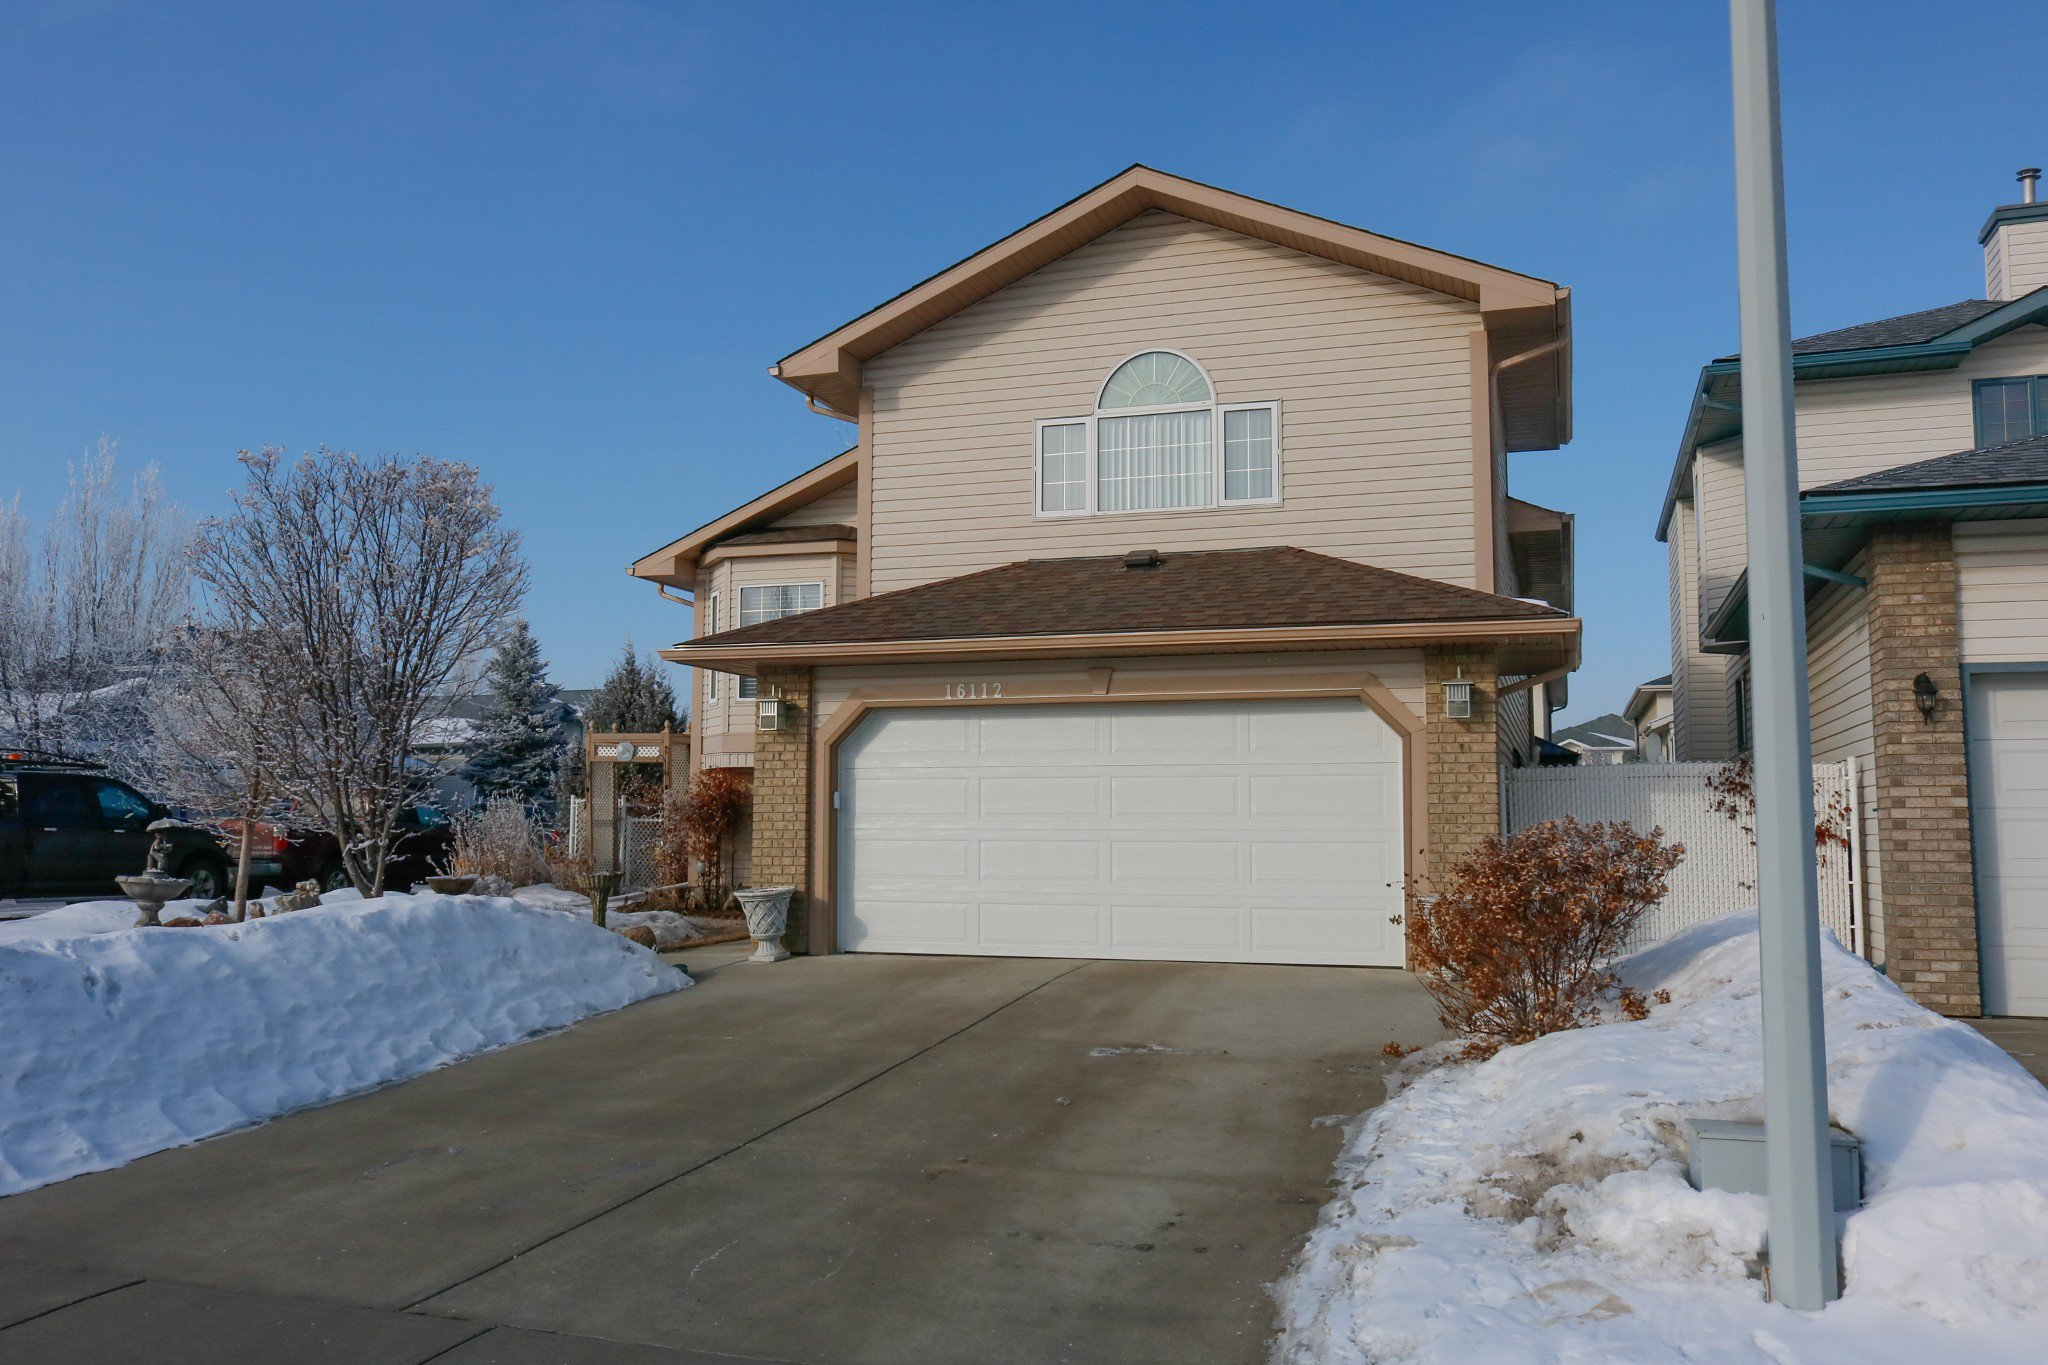 Main Photo: 16112 83 St: Edmonton House for sale